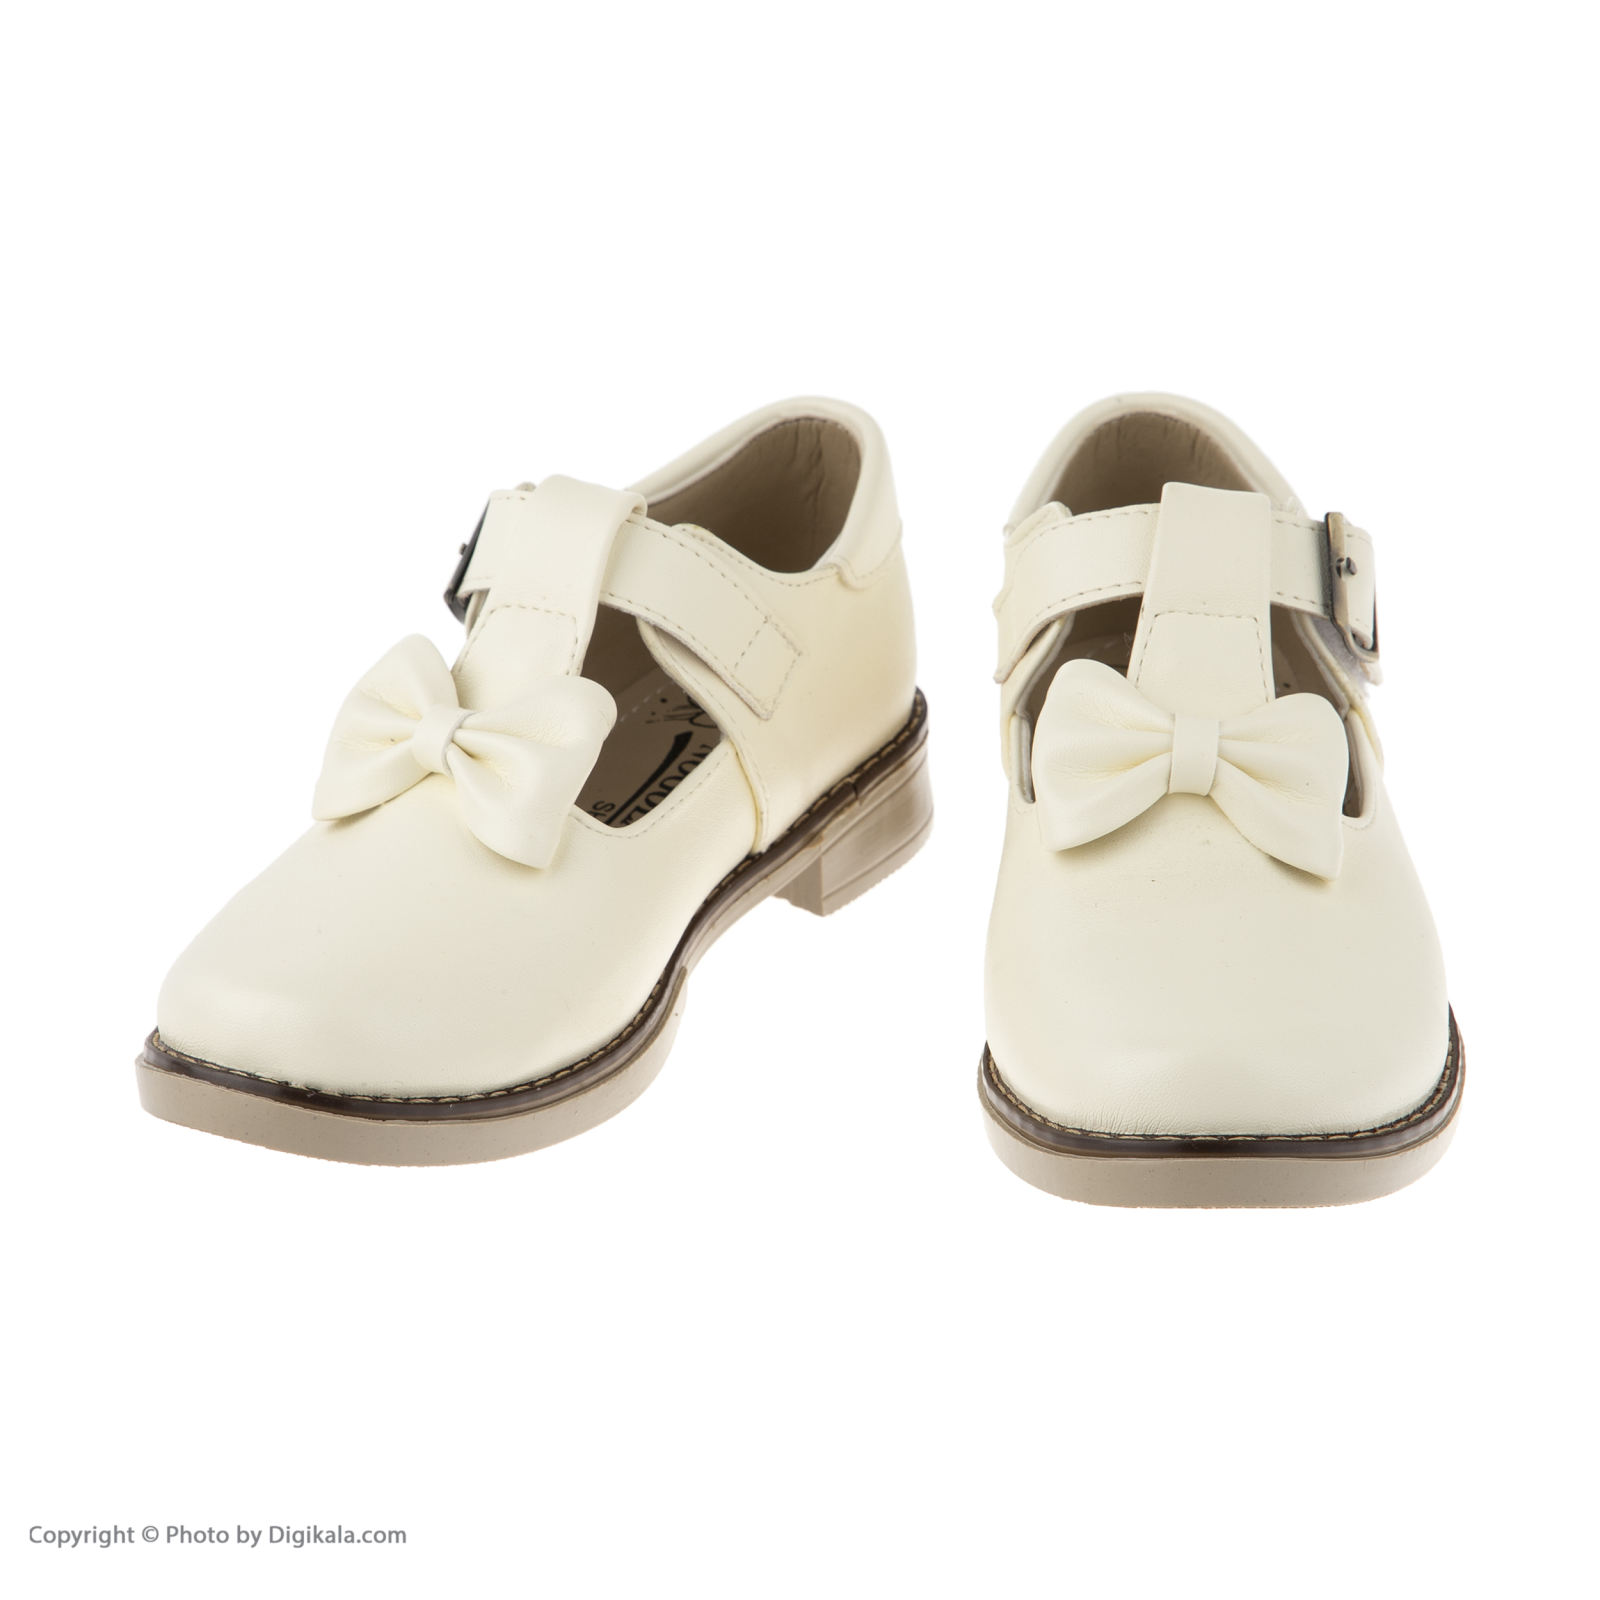 کفش دخترانه کد pa-1034 -  - 4